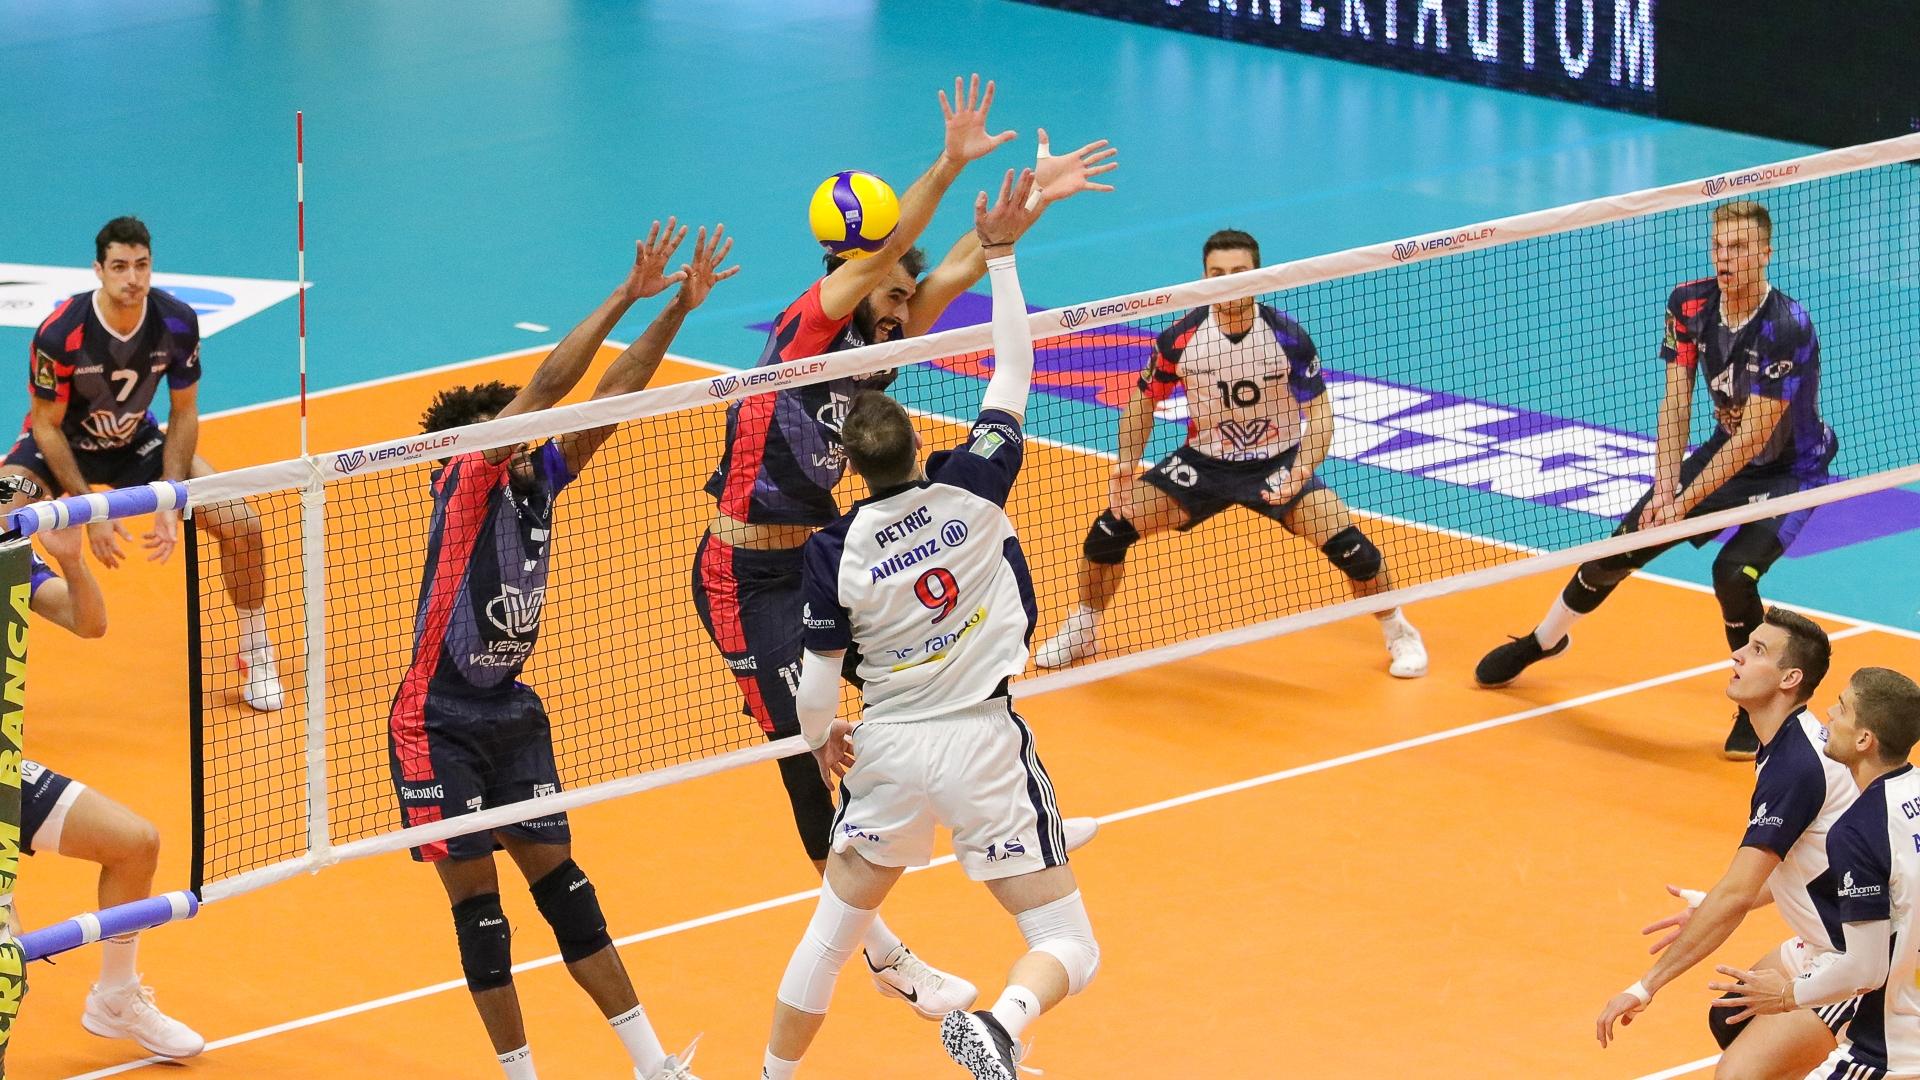 Photogallery: Vero Volley Monza vs Allianz Milano